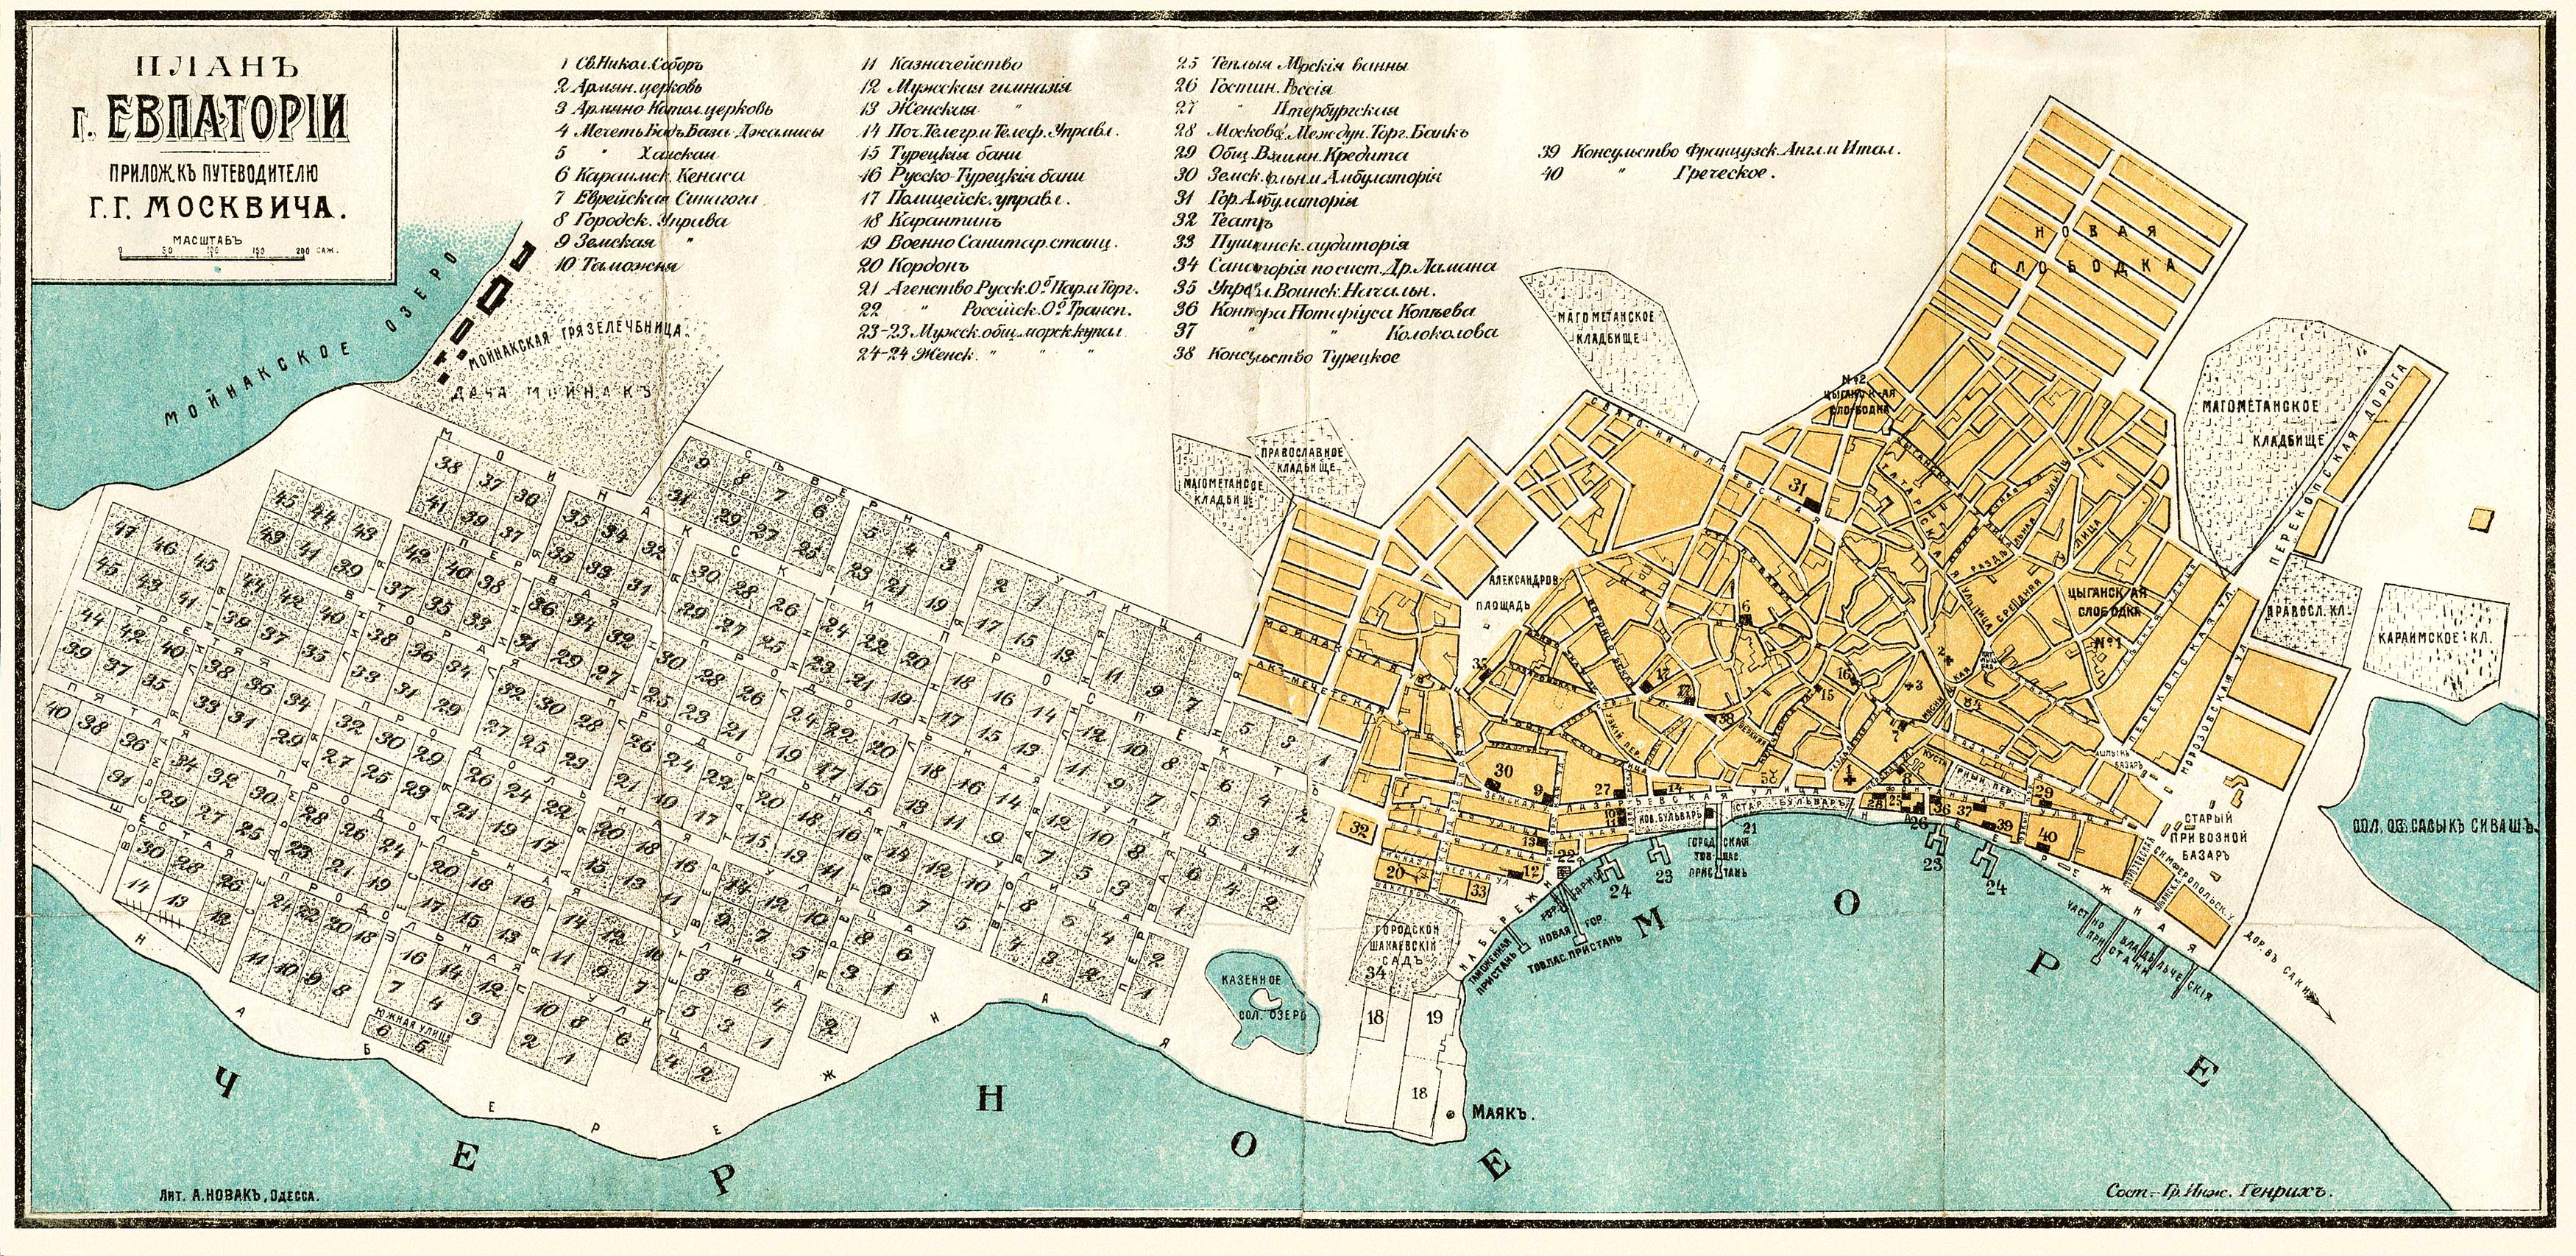 Старый план города Евпатории